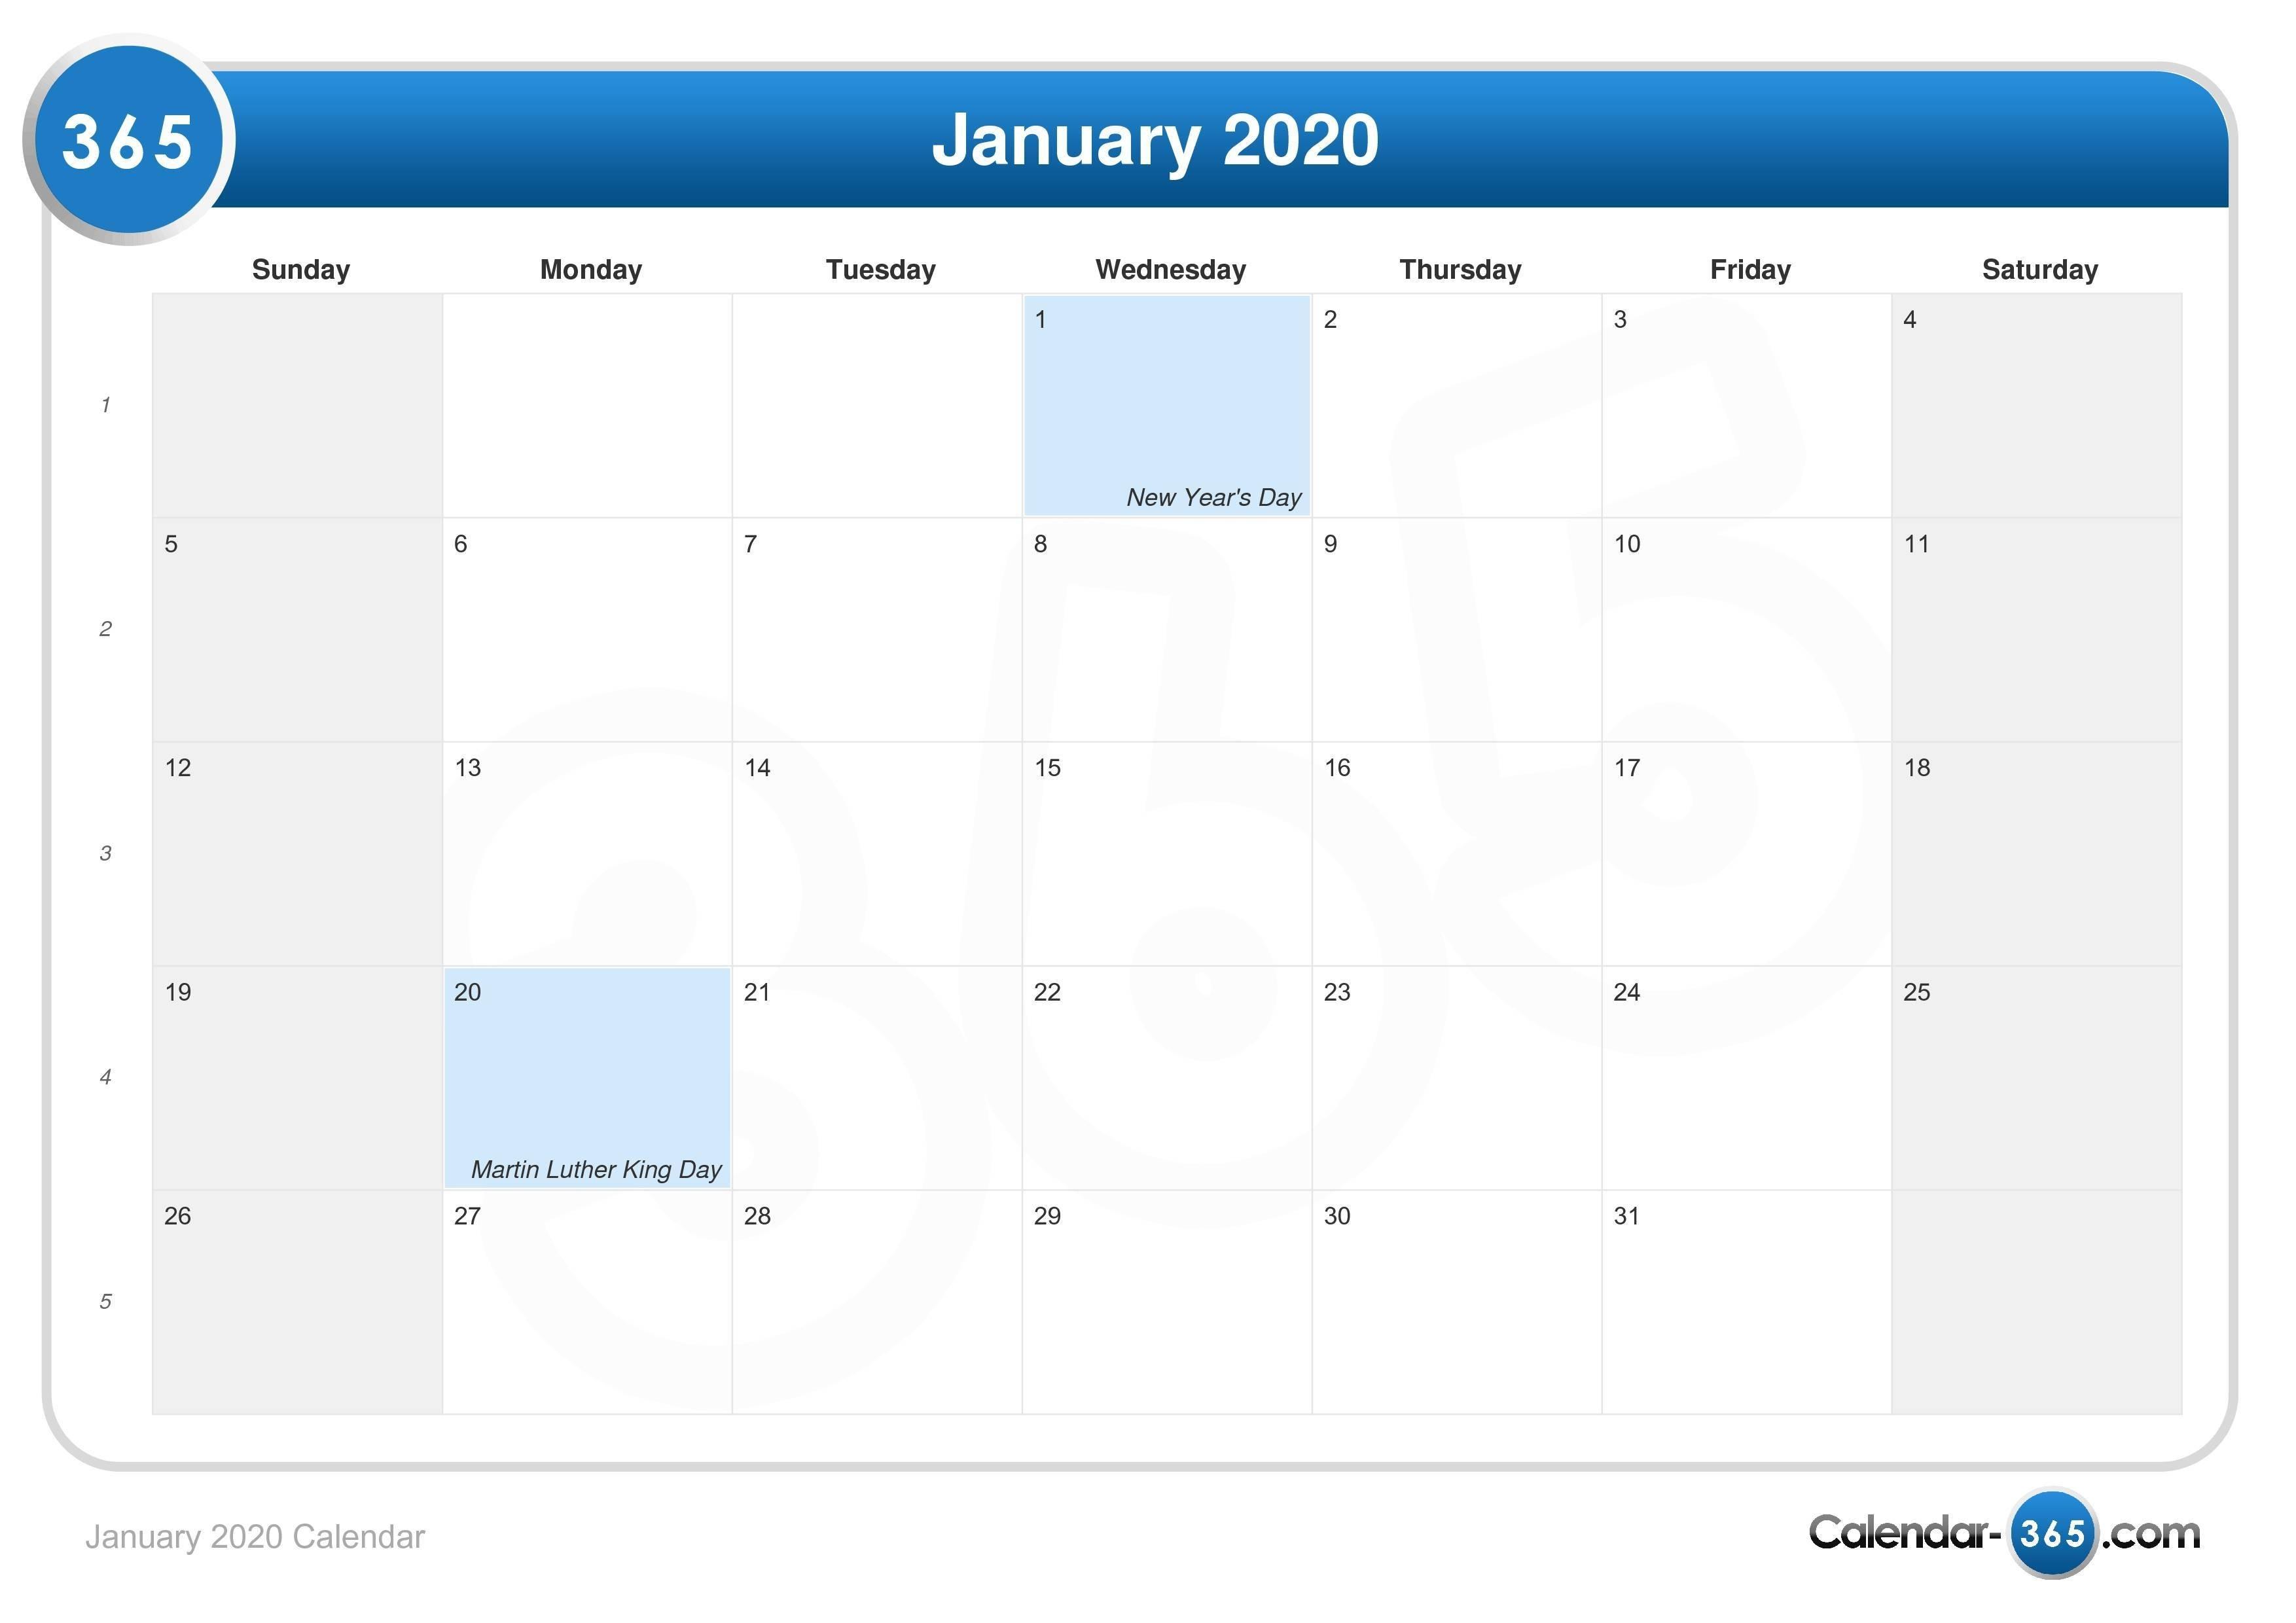 January 2020 Calendar-Show January 2020 Calendar